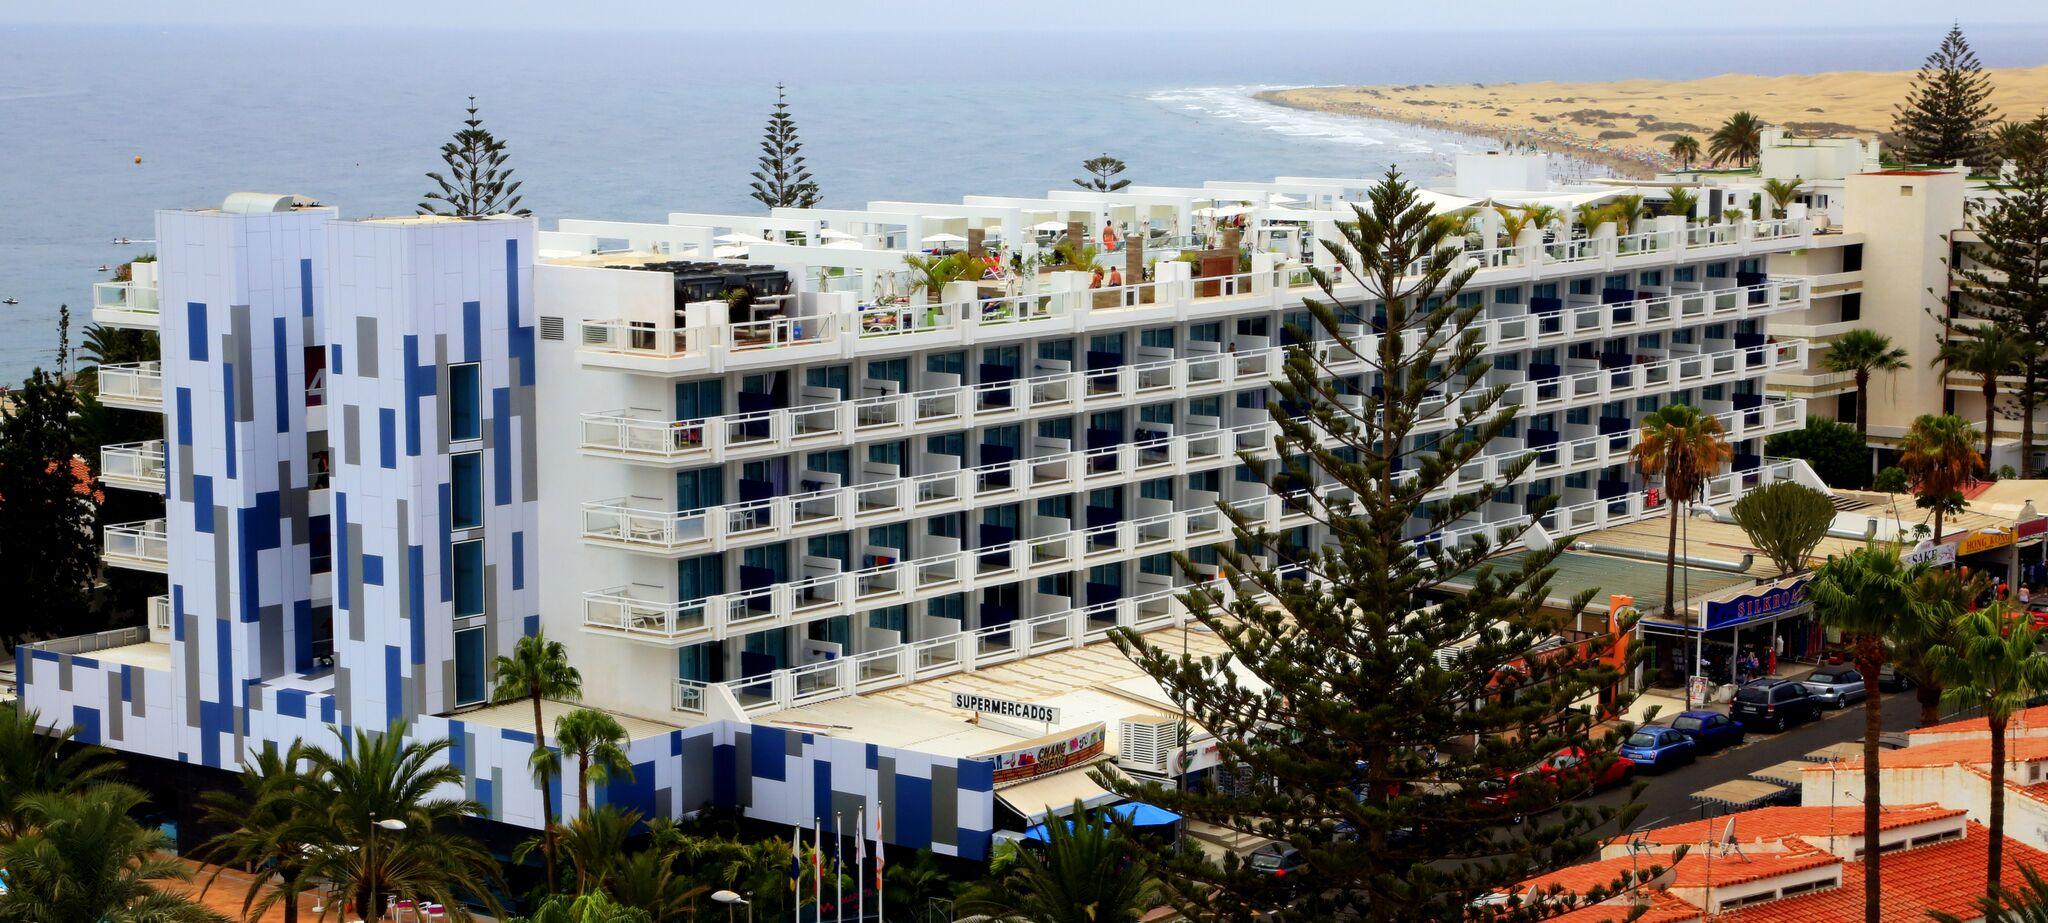 Labranda Marieta Playa Del Ingles Gran Canaria Island Canary